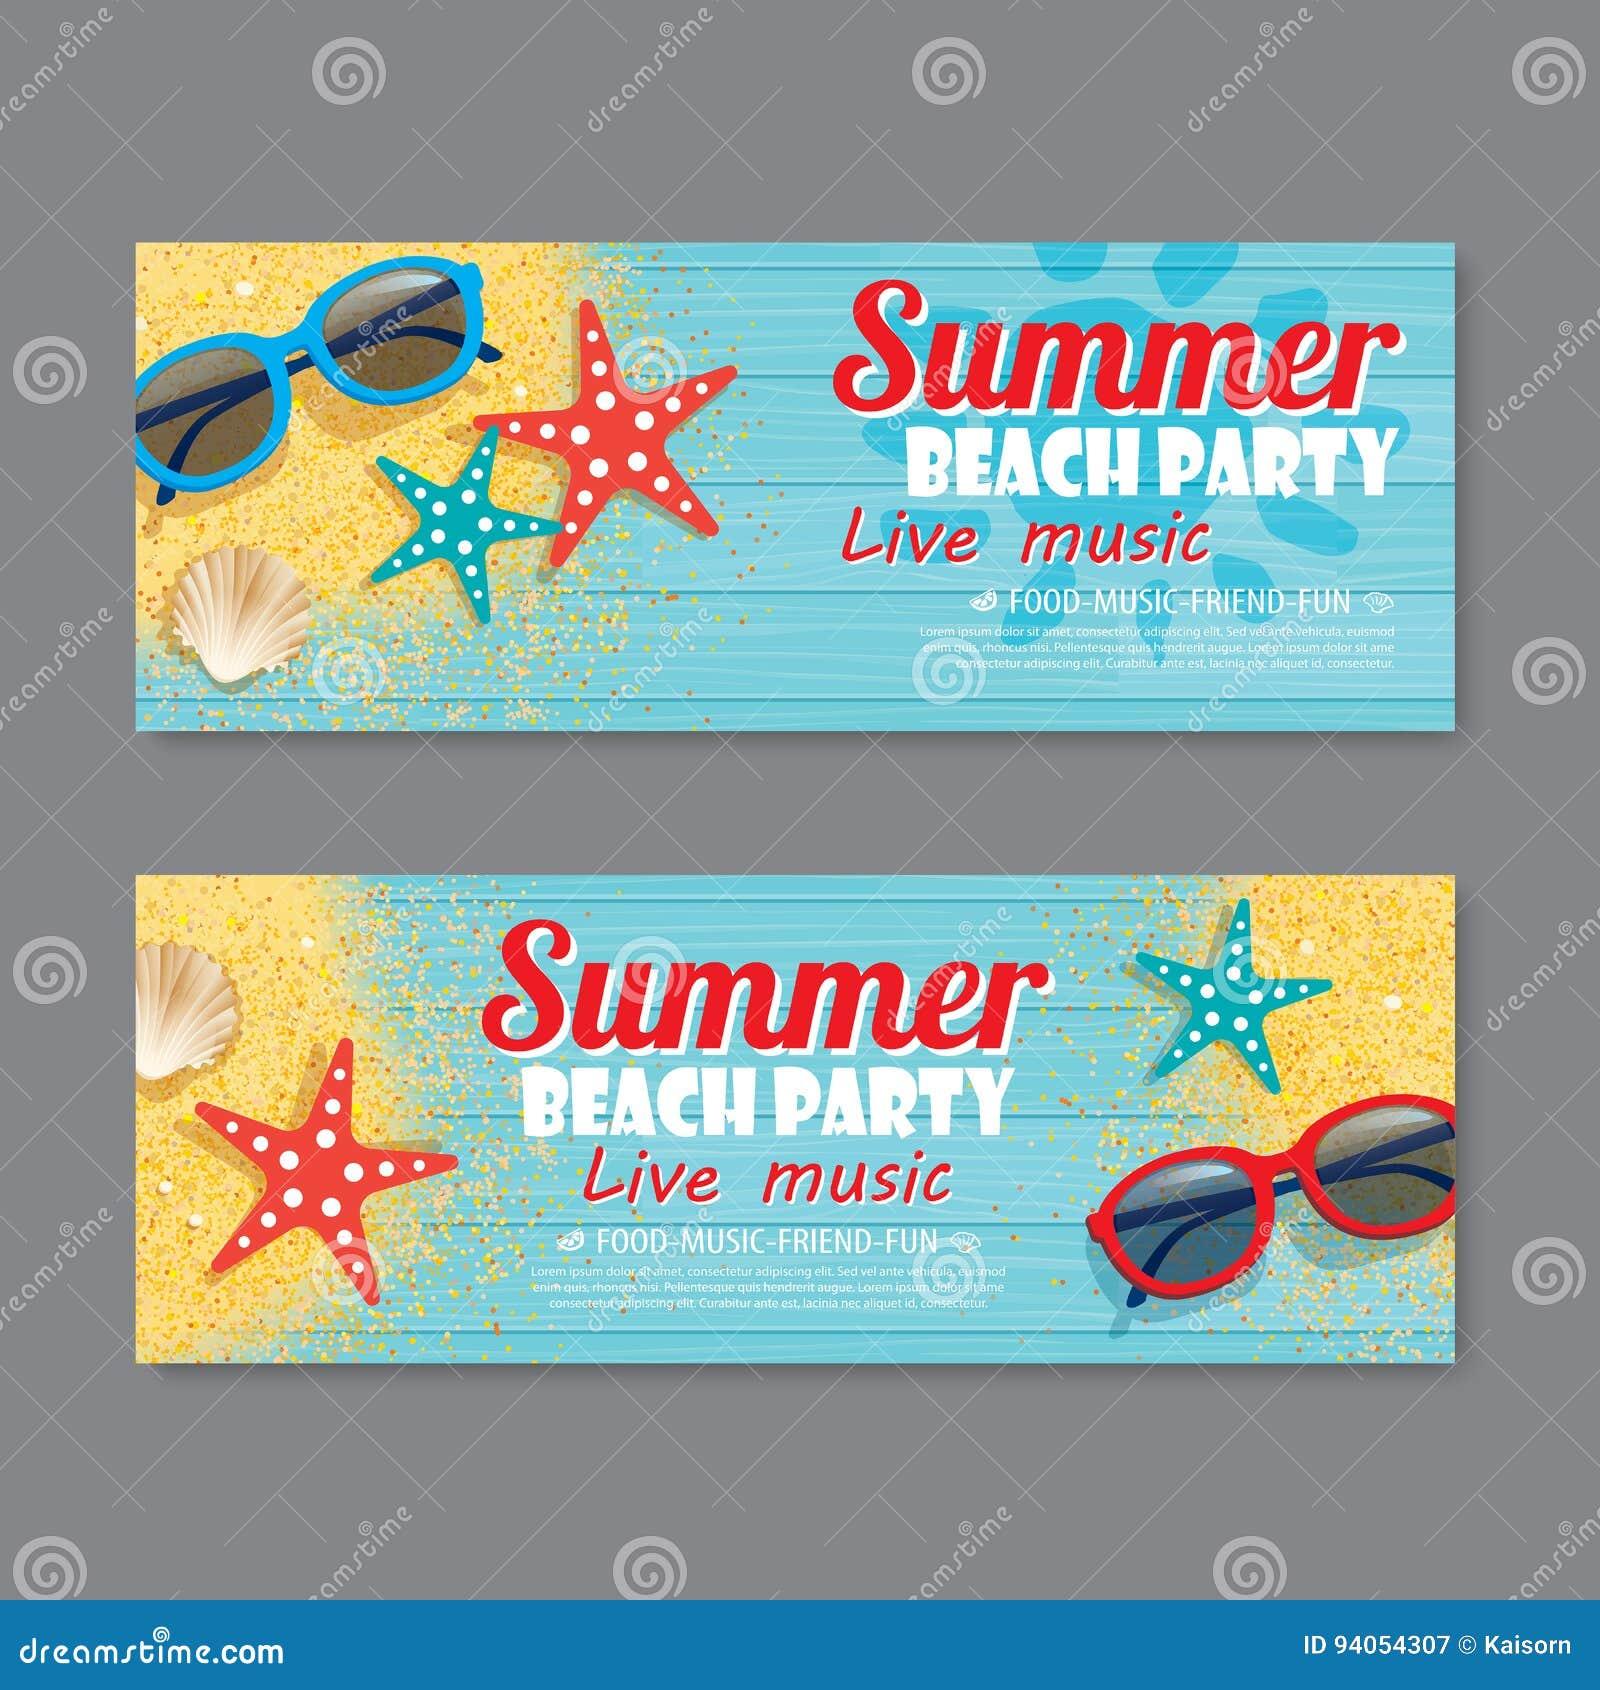 summer beach party invitation ticket background stock